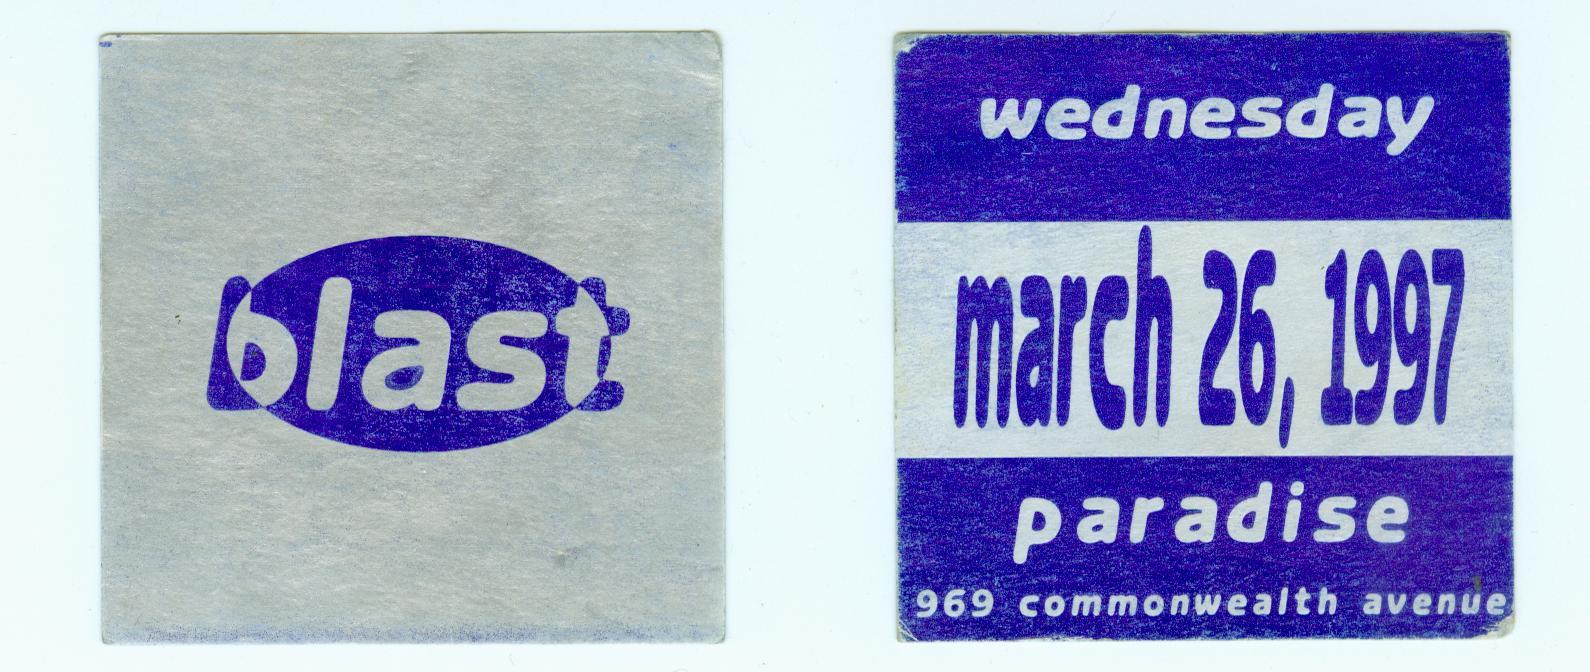 blast march 1997 paradise boston ma